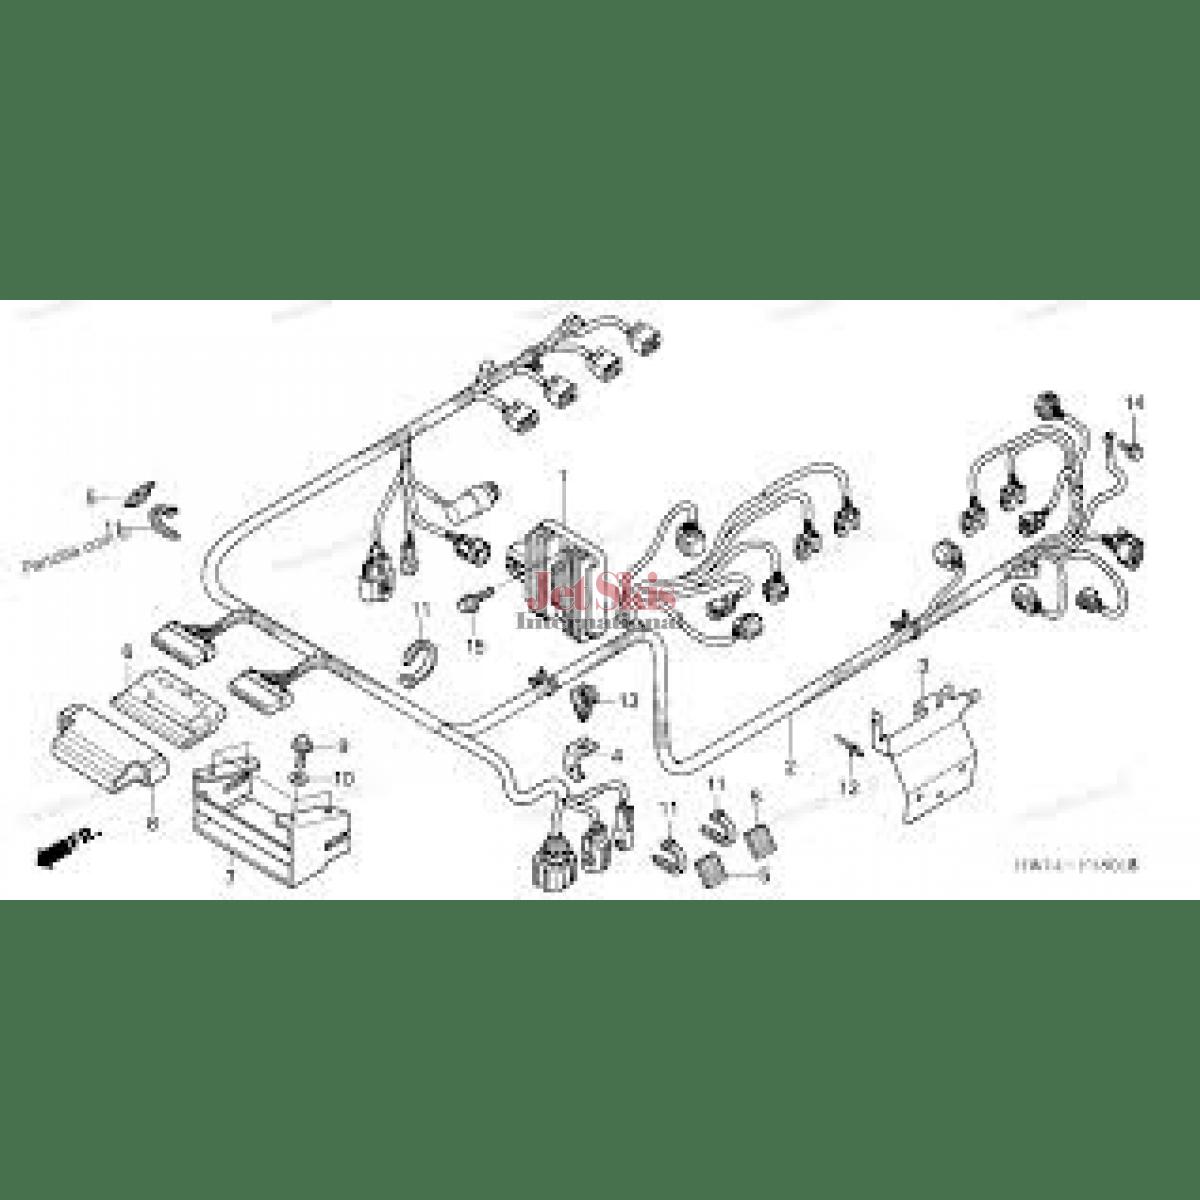 hight resolution of honda 95 civic with 5462 honda ca175 wiring diagram honda aquatrax part 32101 hw3 670 engine harness